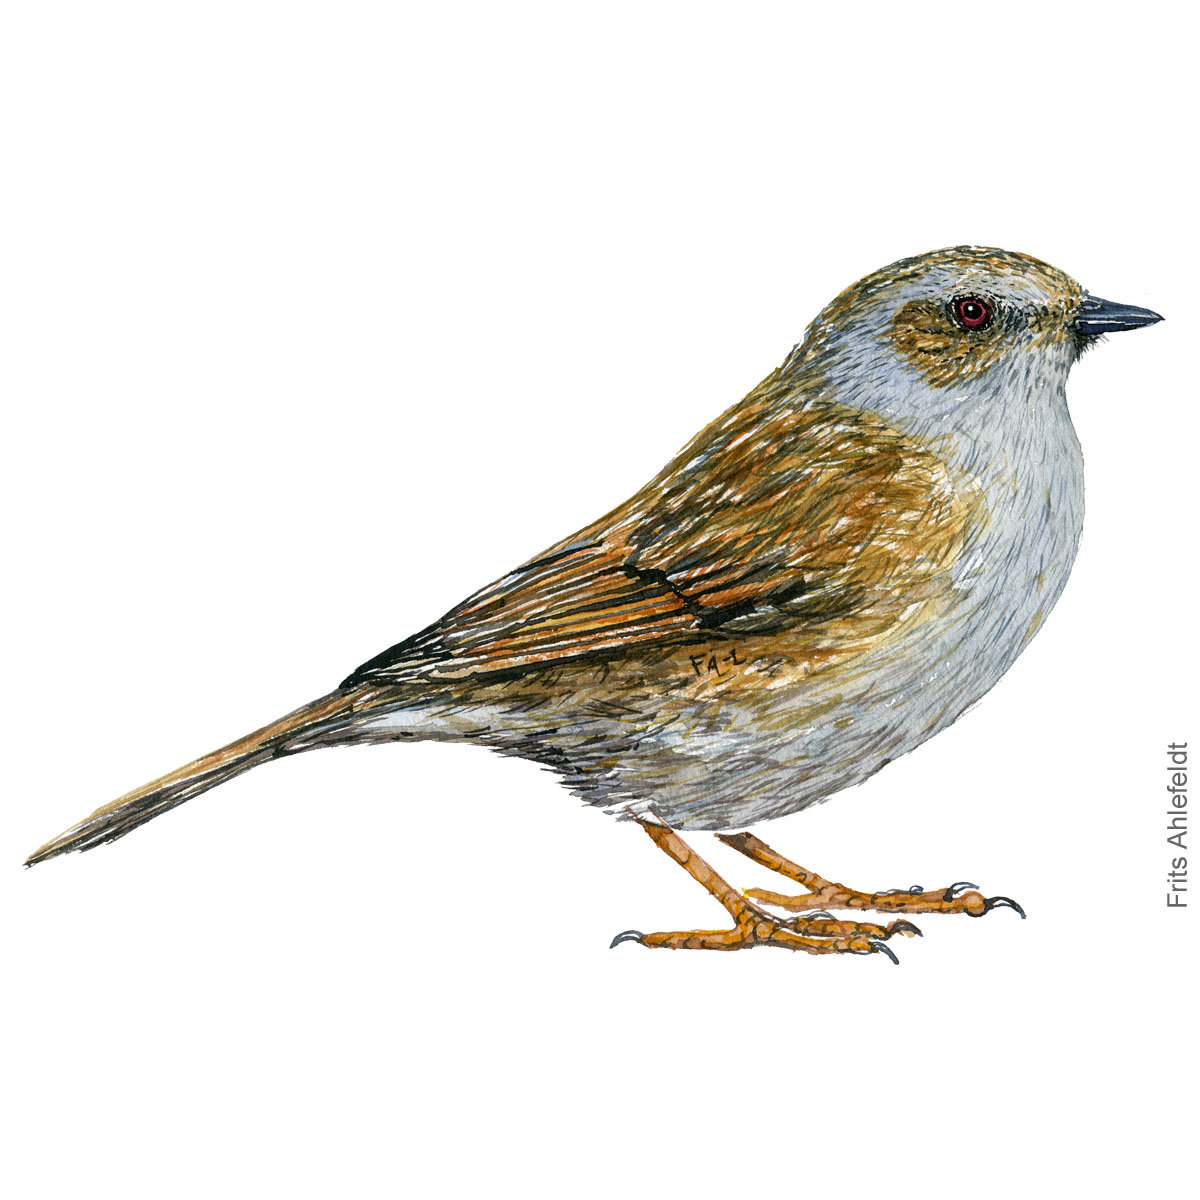 Jernspurv - Dunnock - Bird painting in watercolor by Frits Ahlefeldt - Fugle akvarel